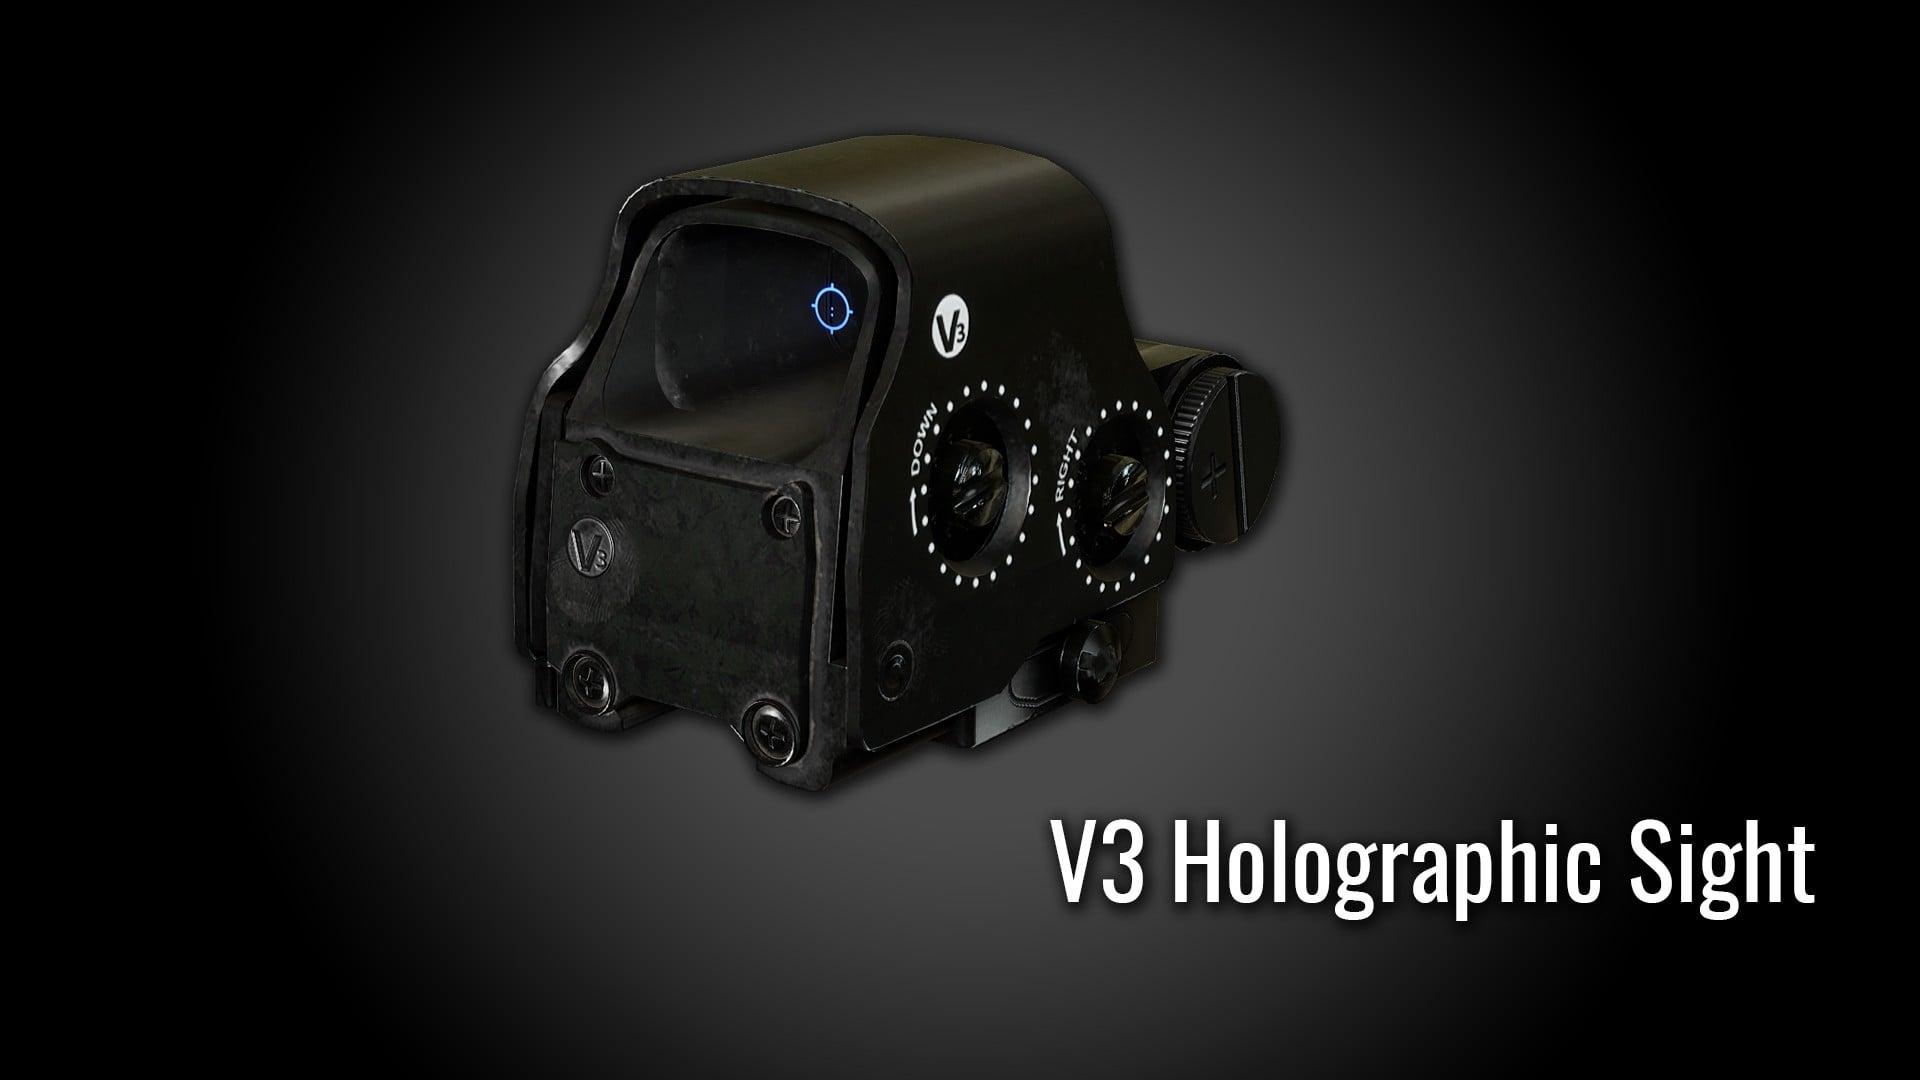 V3 Holographic Sight